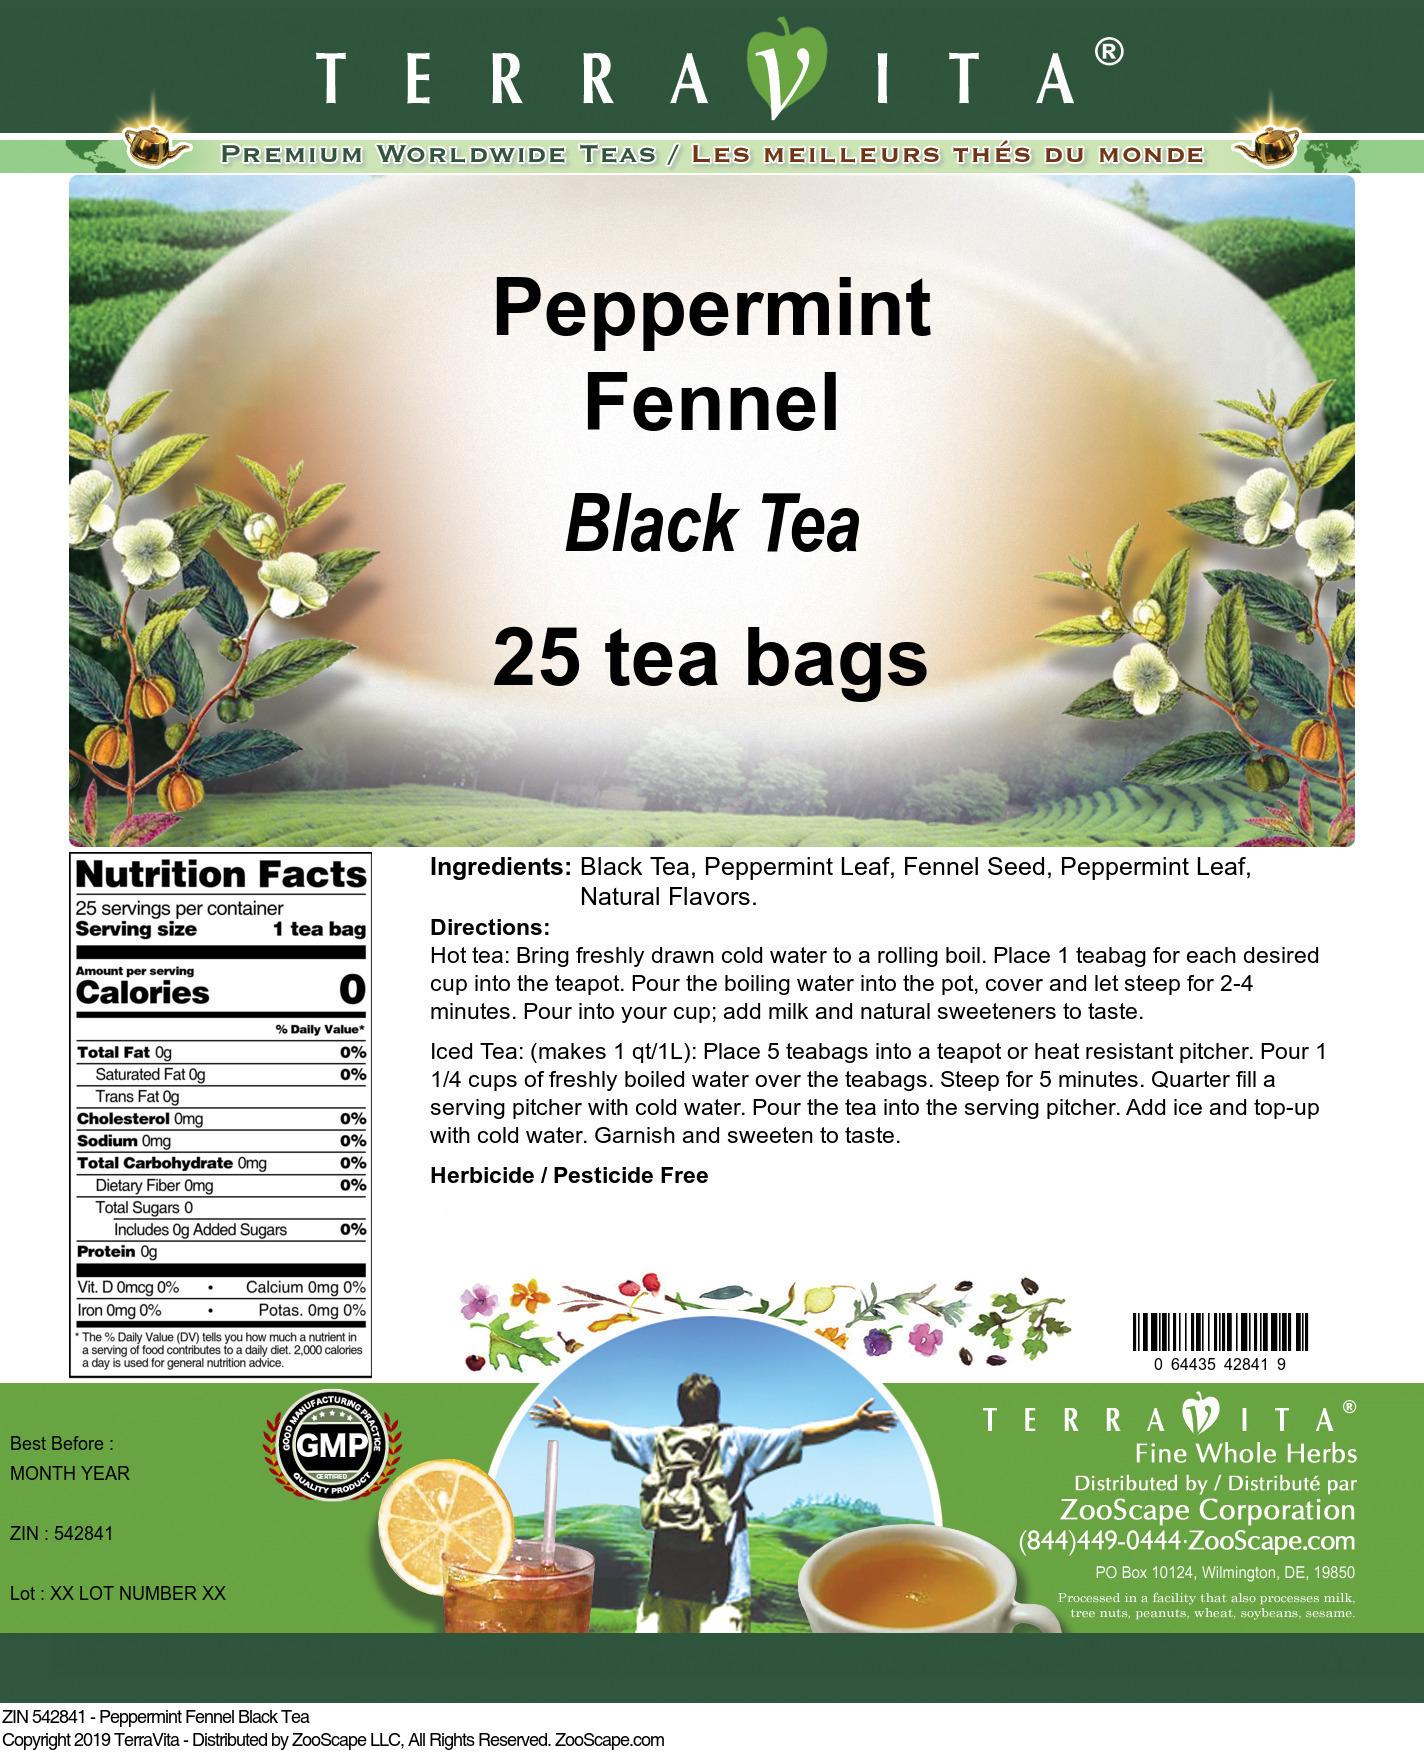 Peppermint Fennel Black Tea